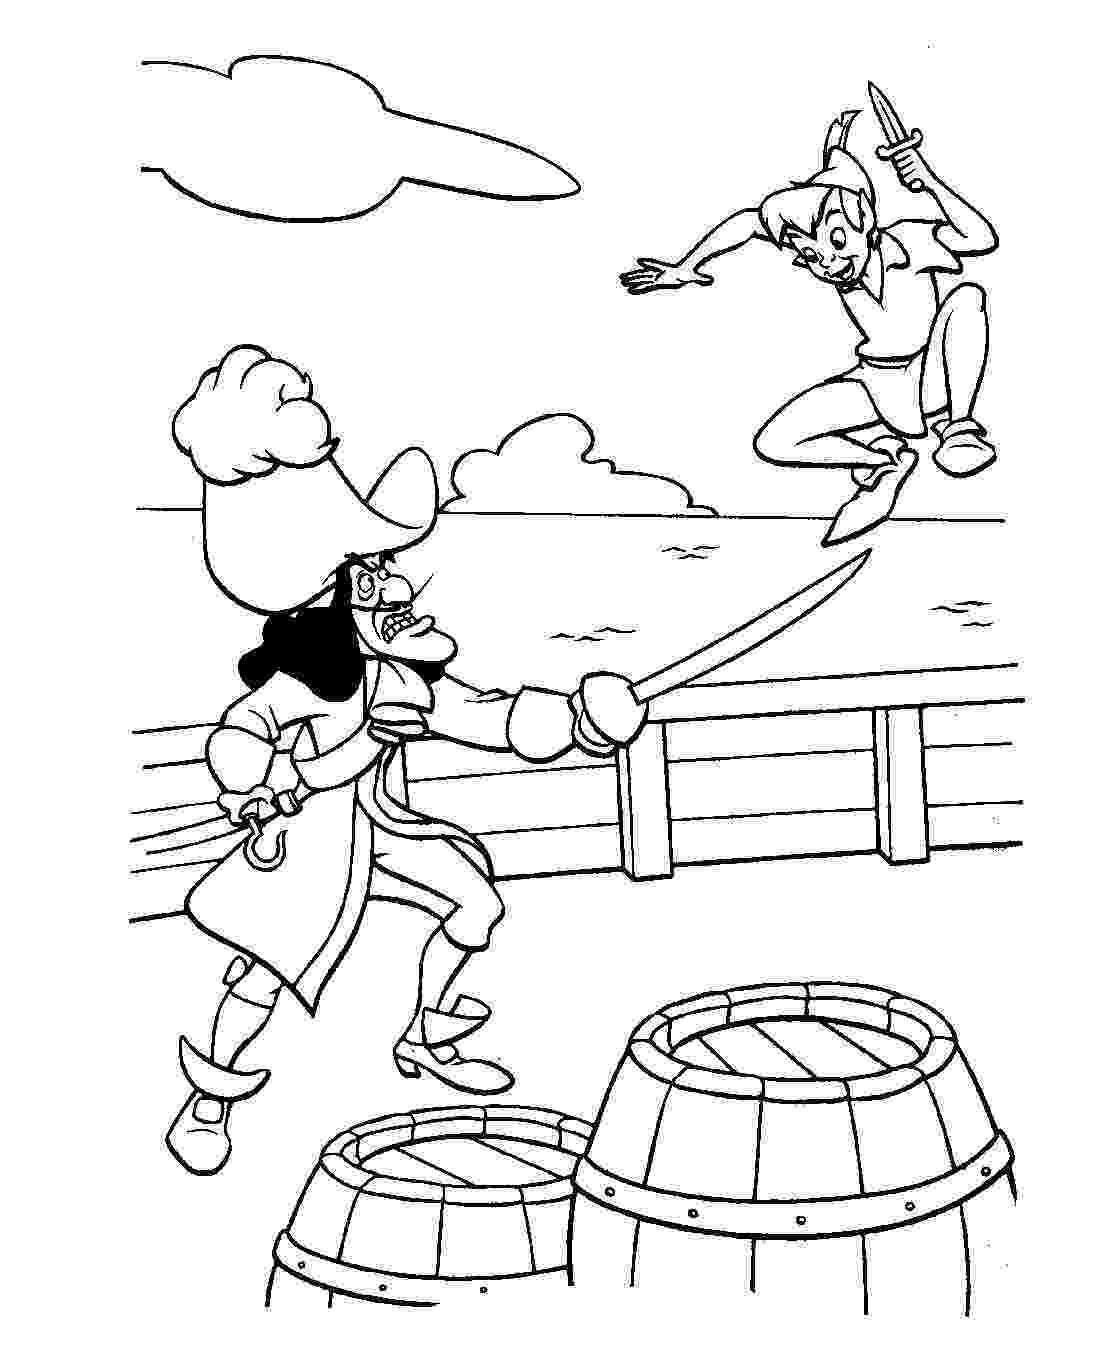 peter pan coloring pages free free printable peter pan coloring pages for kids cool2bkids free peter pages coloring pan